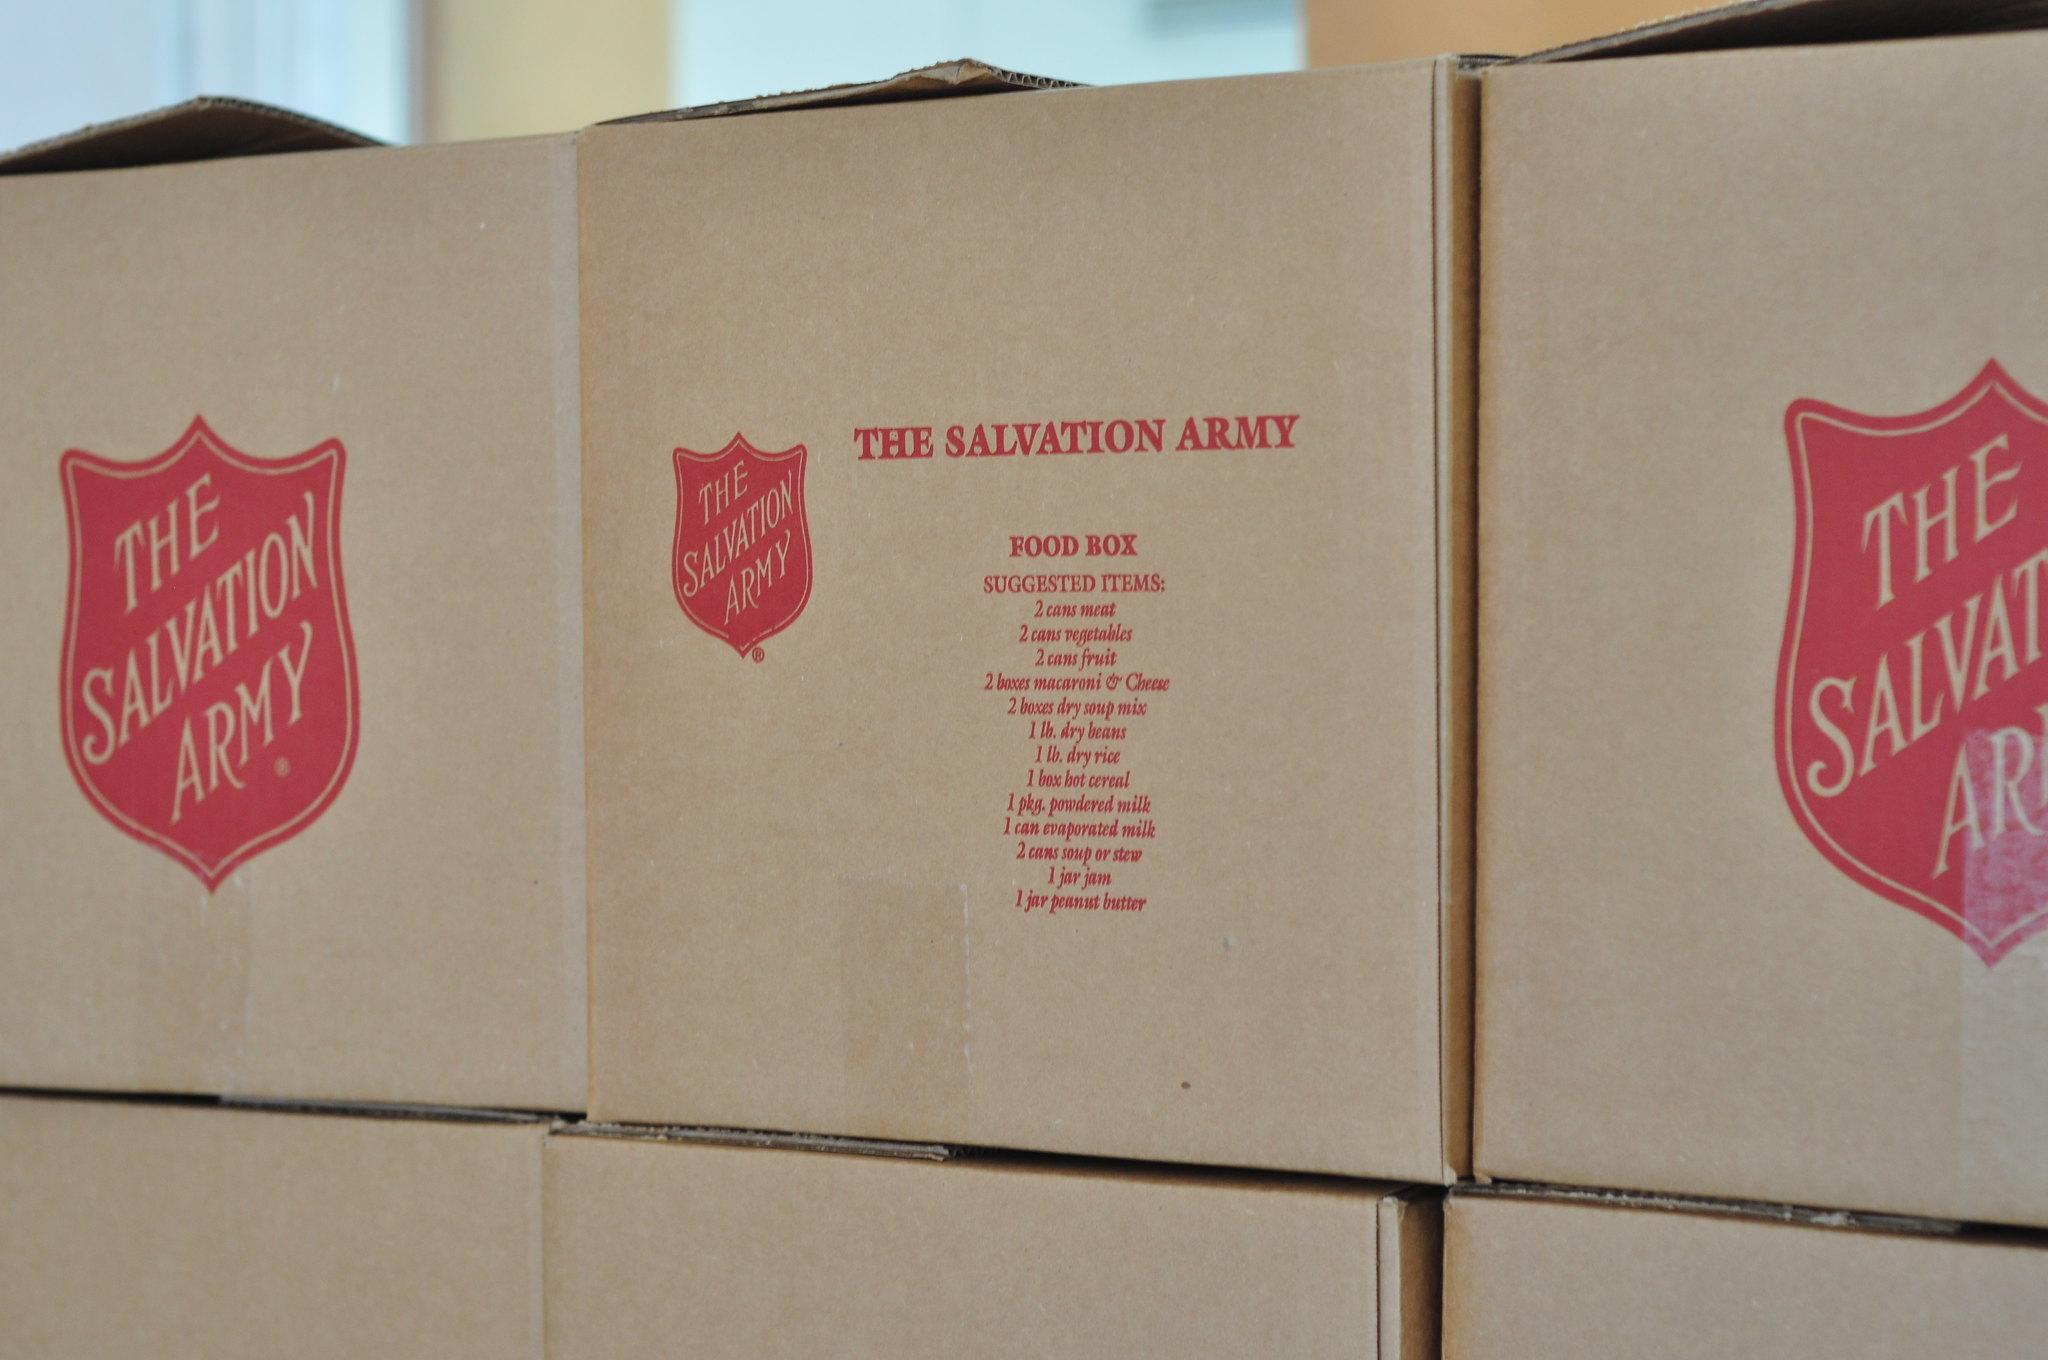 Salvation Army Soup Kitchen Waco